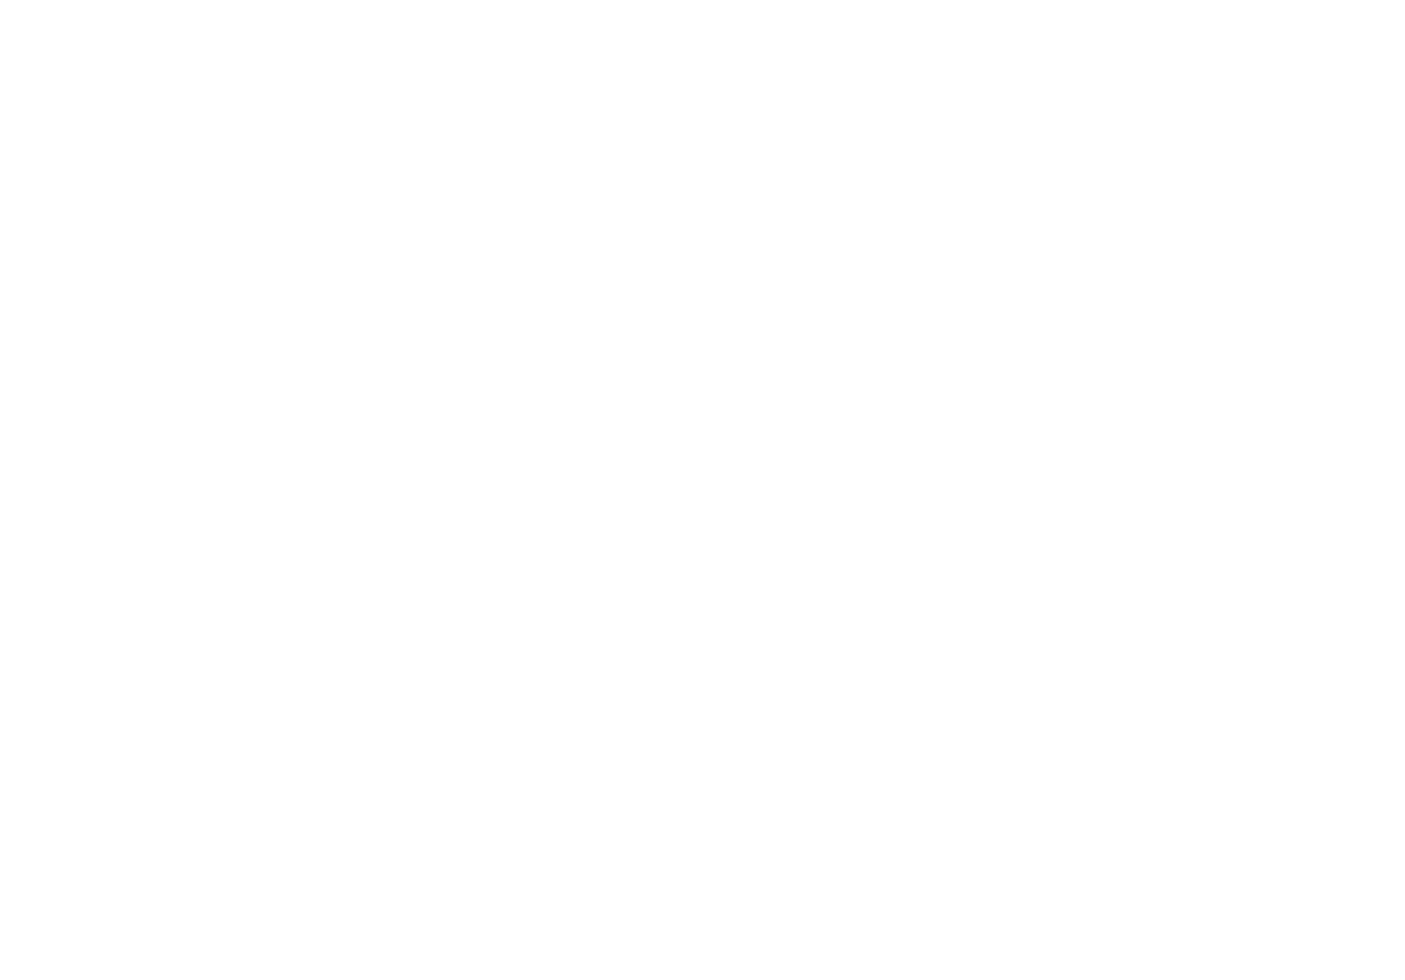 logo de ojo